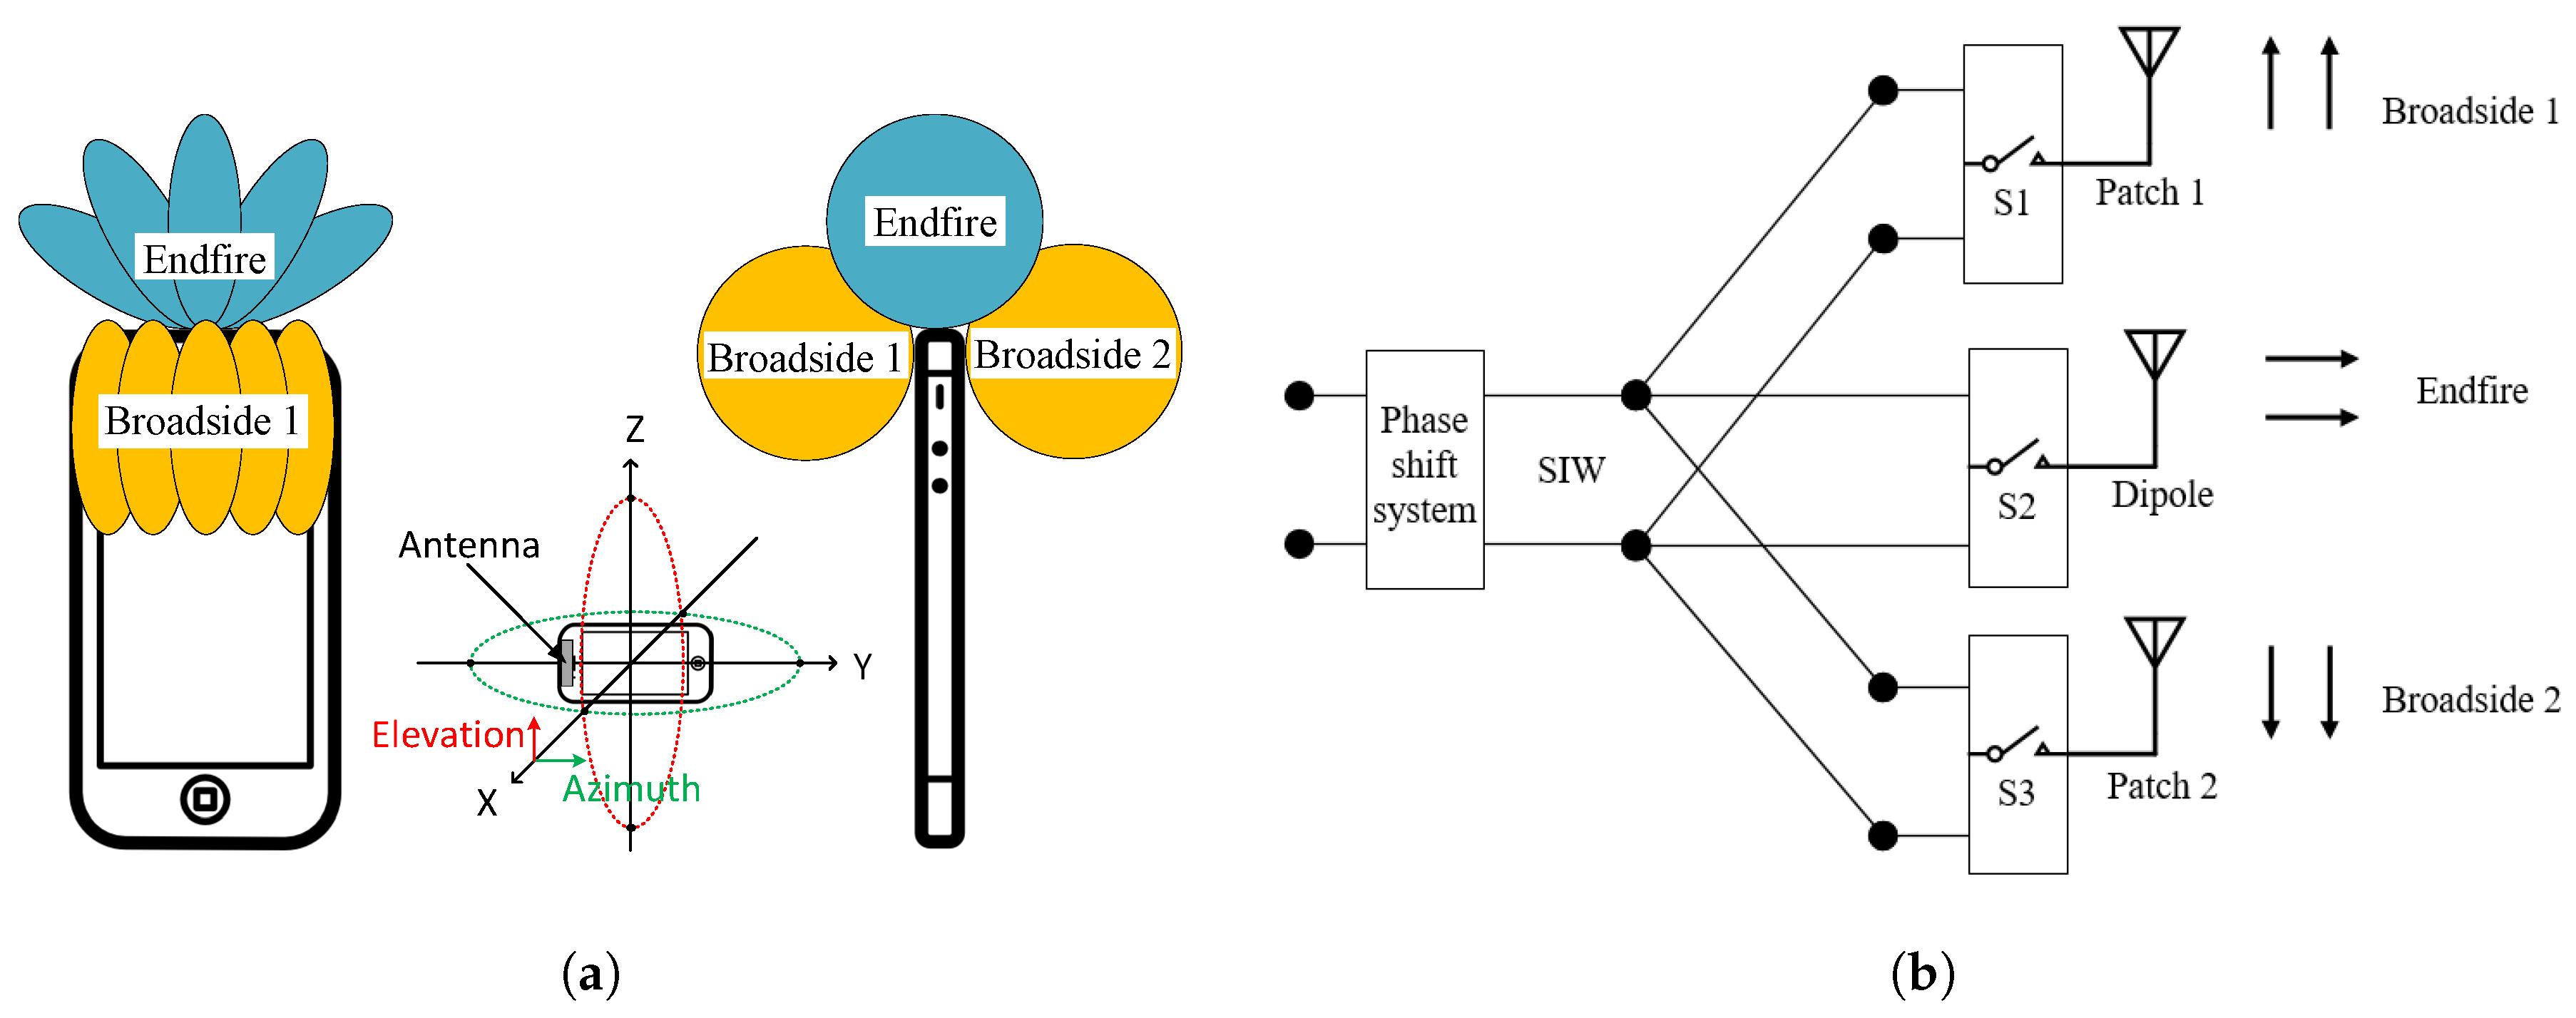 phased array - Ataum berglauf-verband com